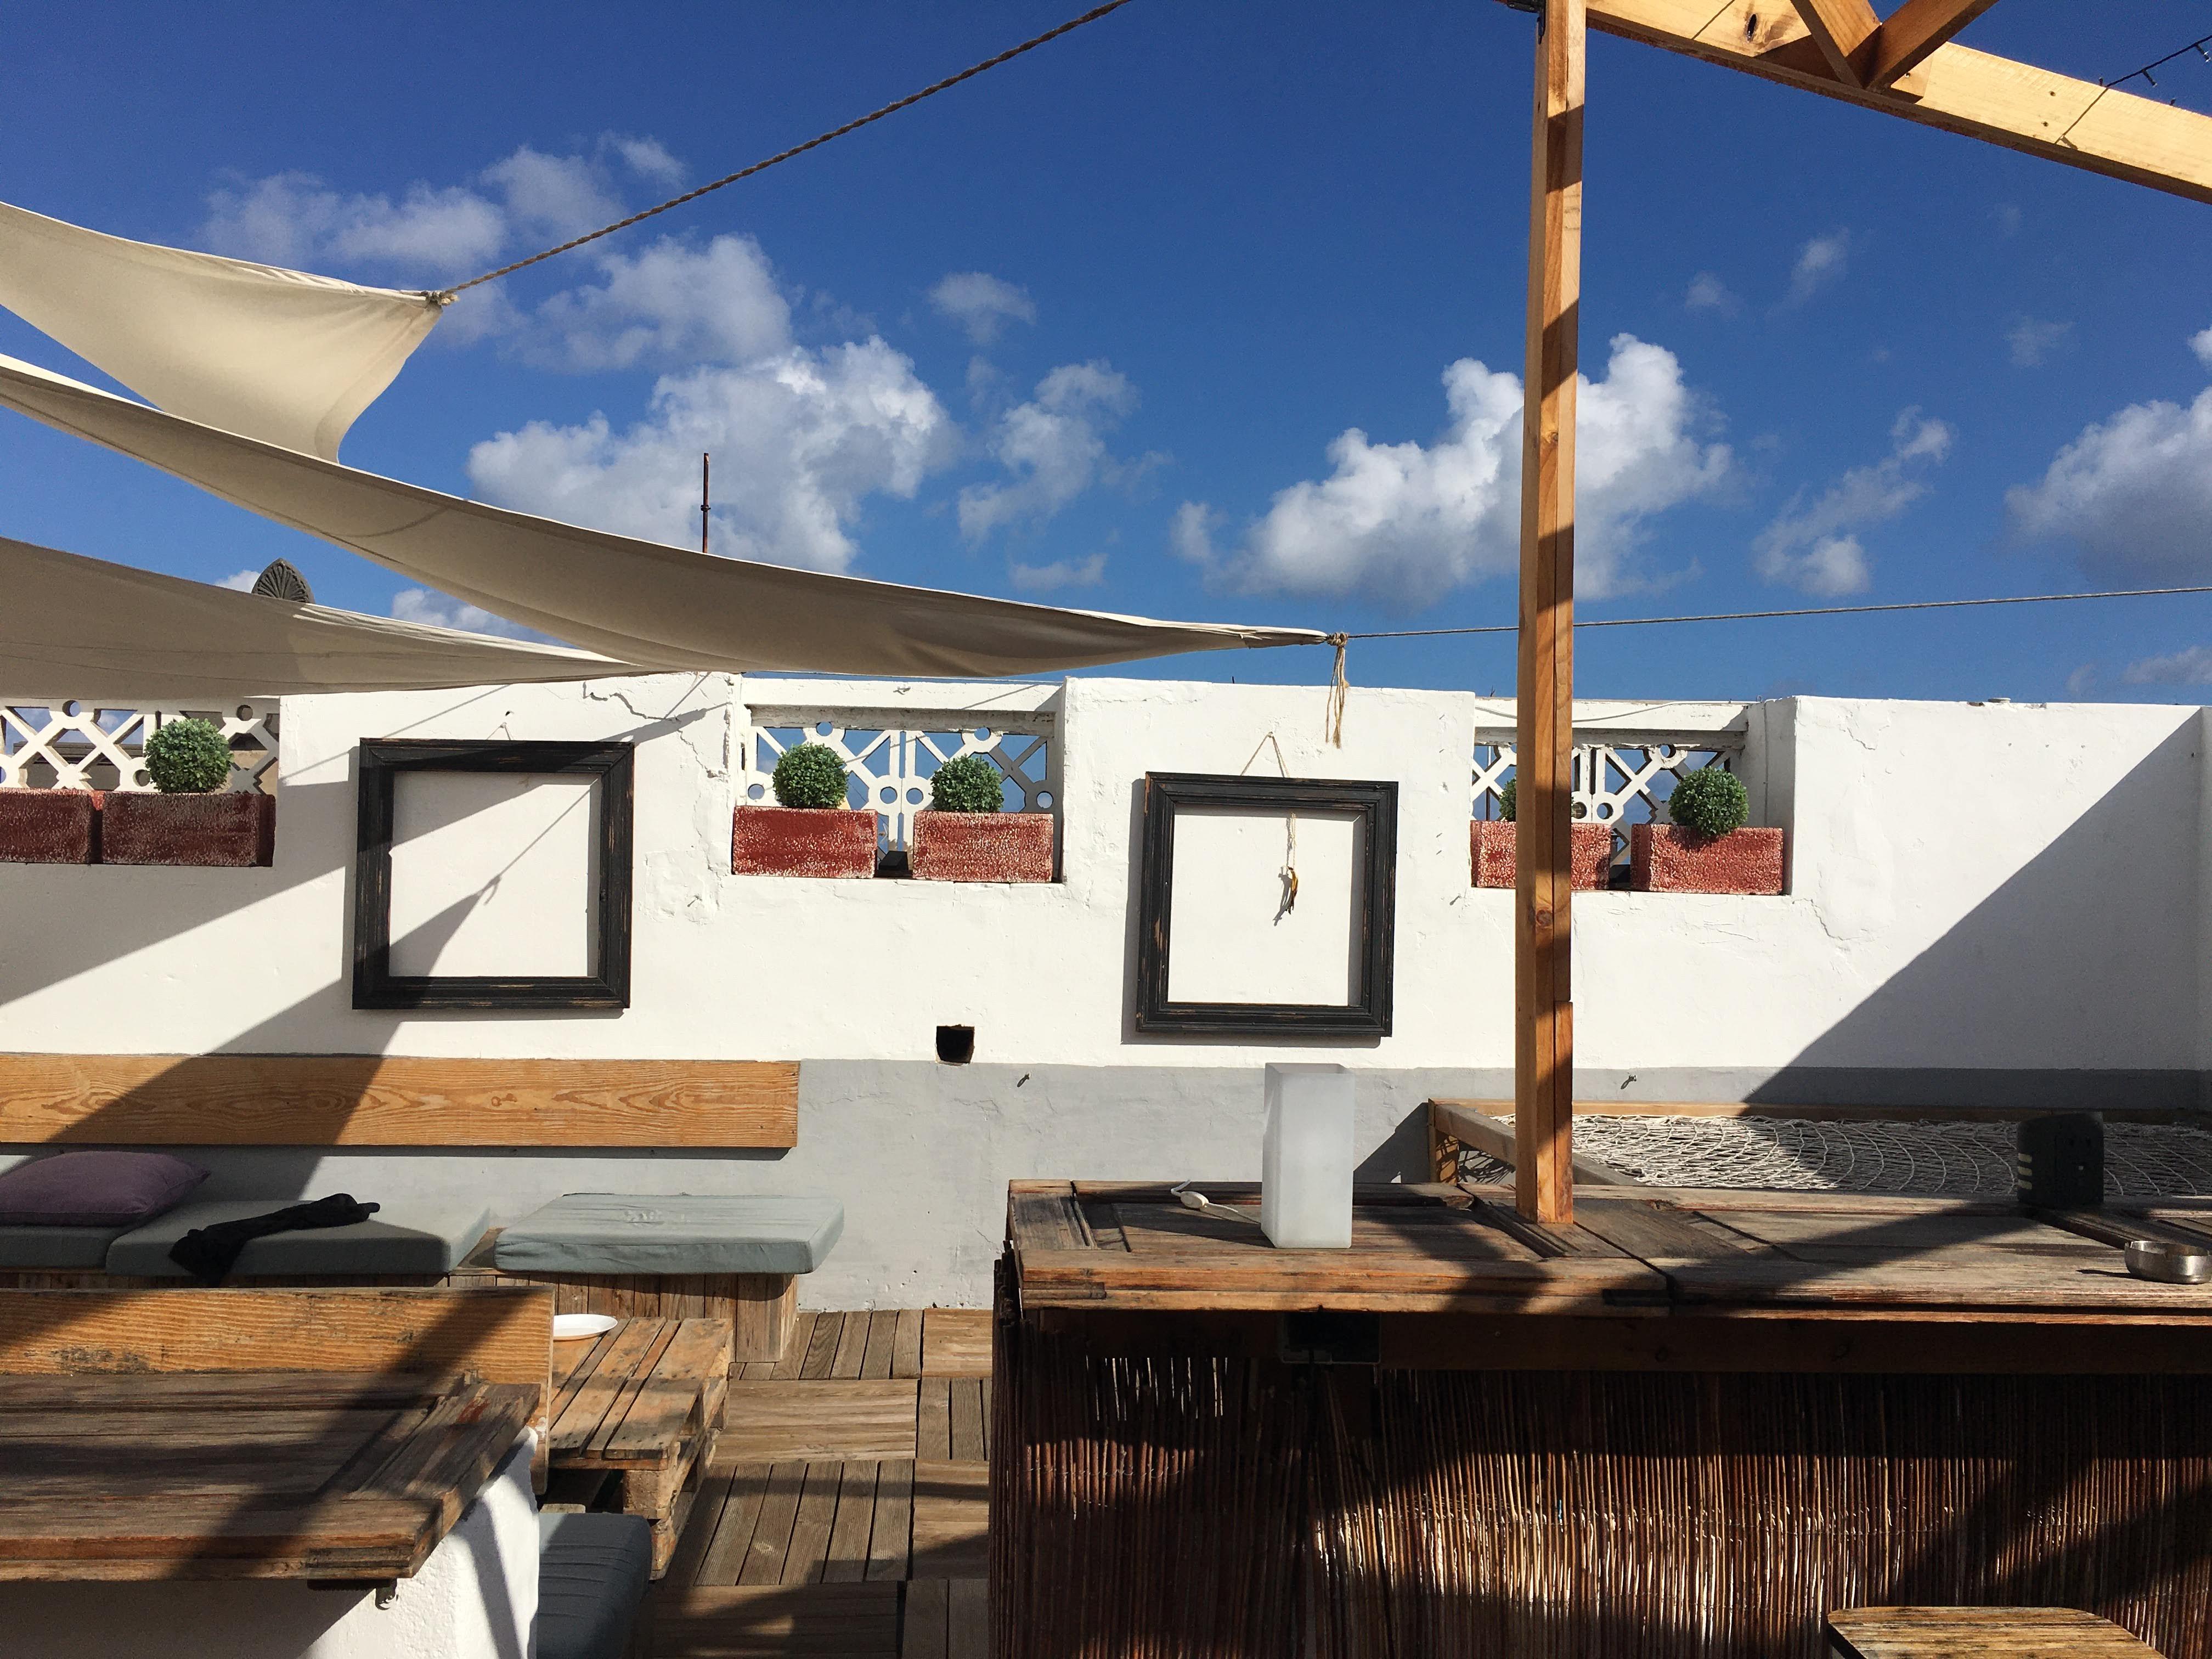 hostel Gran Canaria rooftop bar